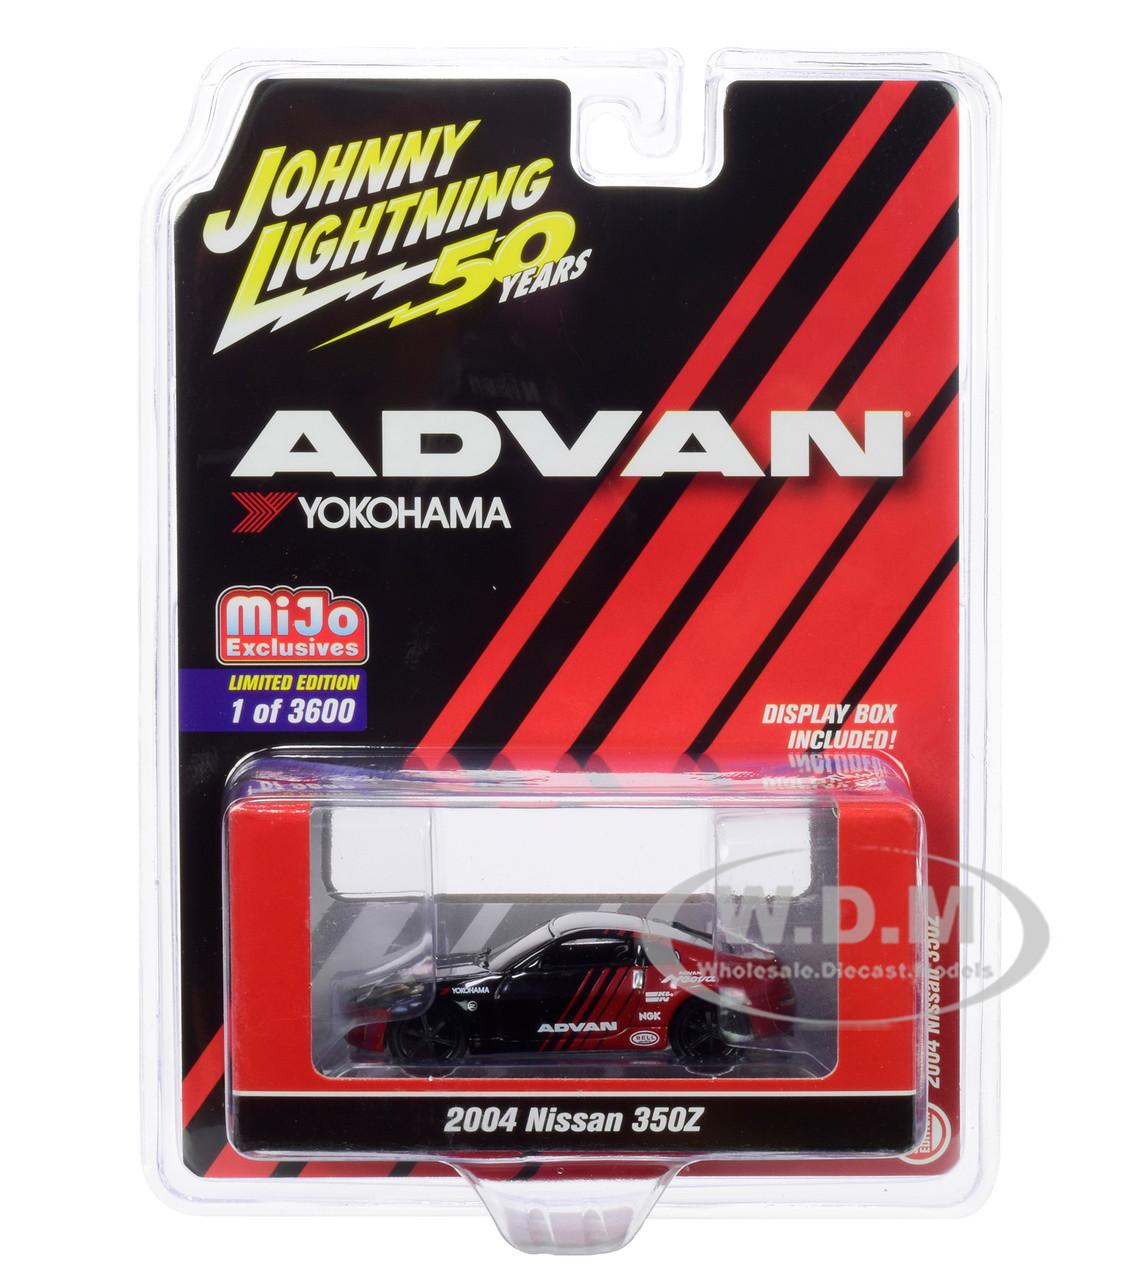 2004 Nissan 350Z ADVAN Yokohama Johnny Lightning 50th Anniversary Limited Edition to 3600 Pieces 1//64 Diecast Model Car by Johnny Lightning JLCP7241